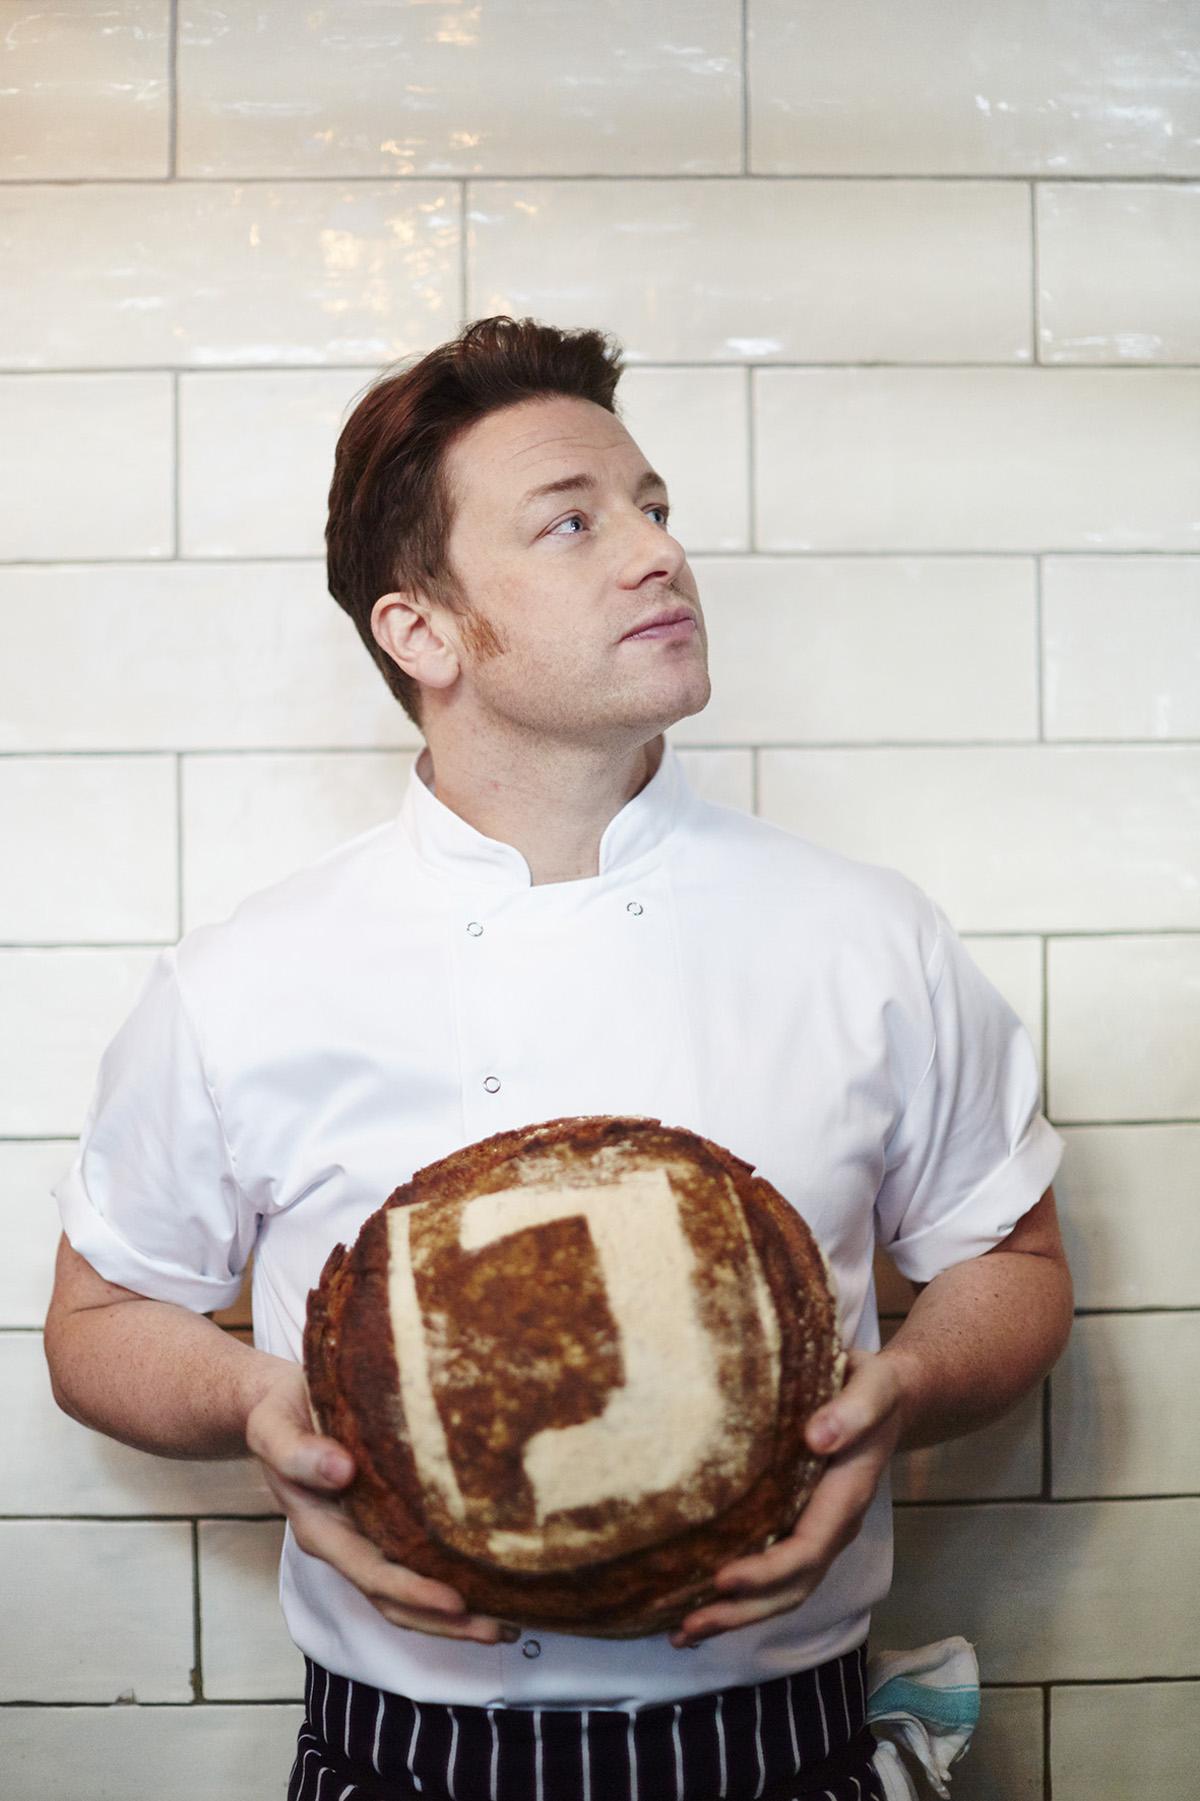 Gastro-News-Jamie-Oliver-er-ffnet-n-chstes-Lokal-am-Flughafen